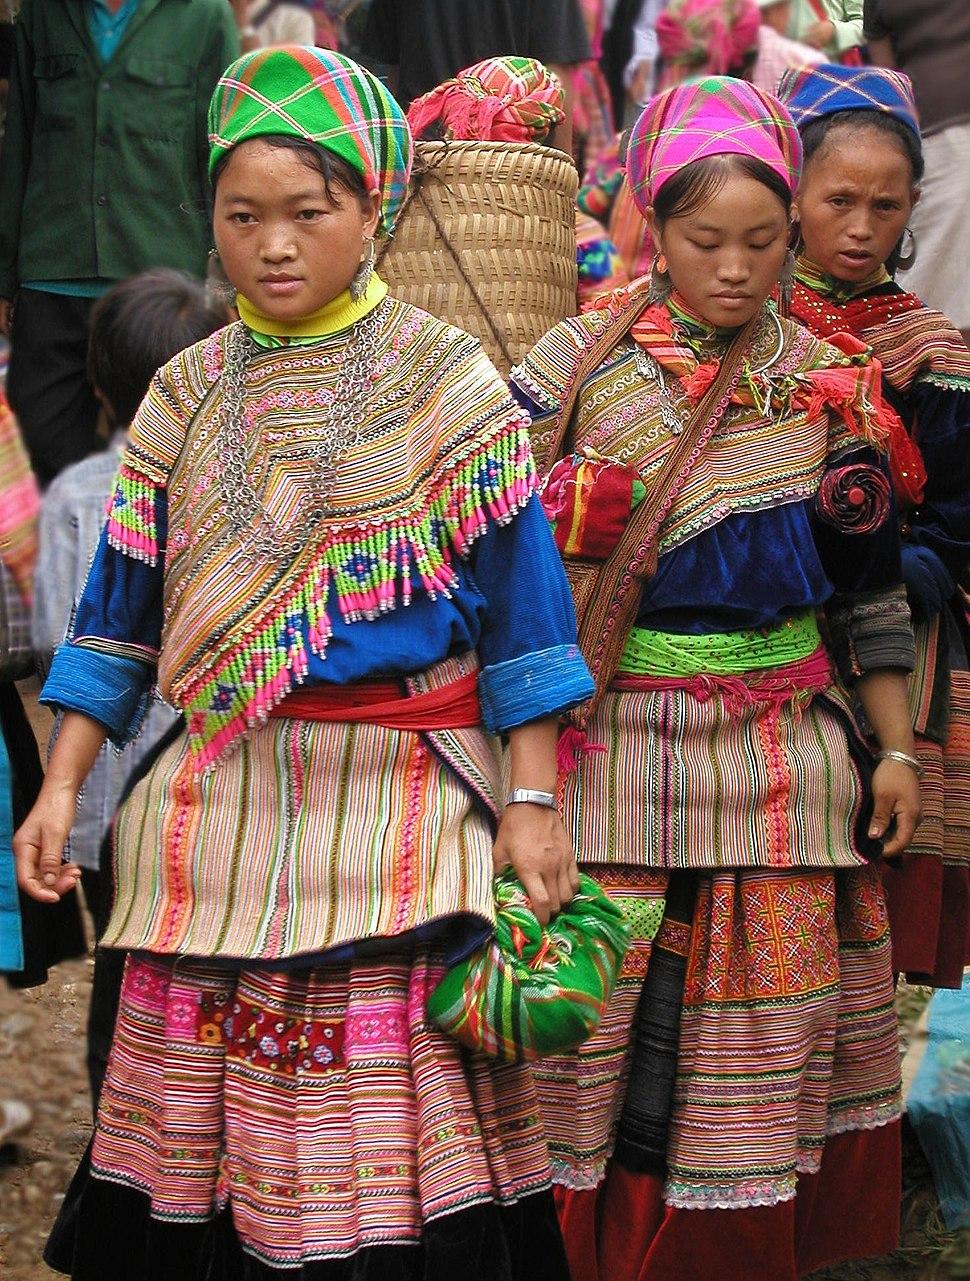 Hmong women at Coc Ly market, Sapa, Vietnam